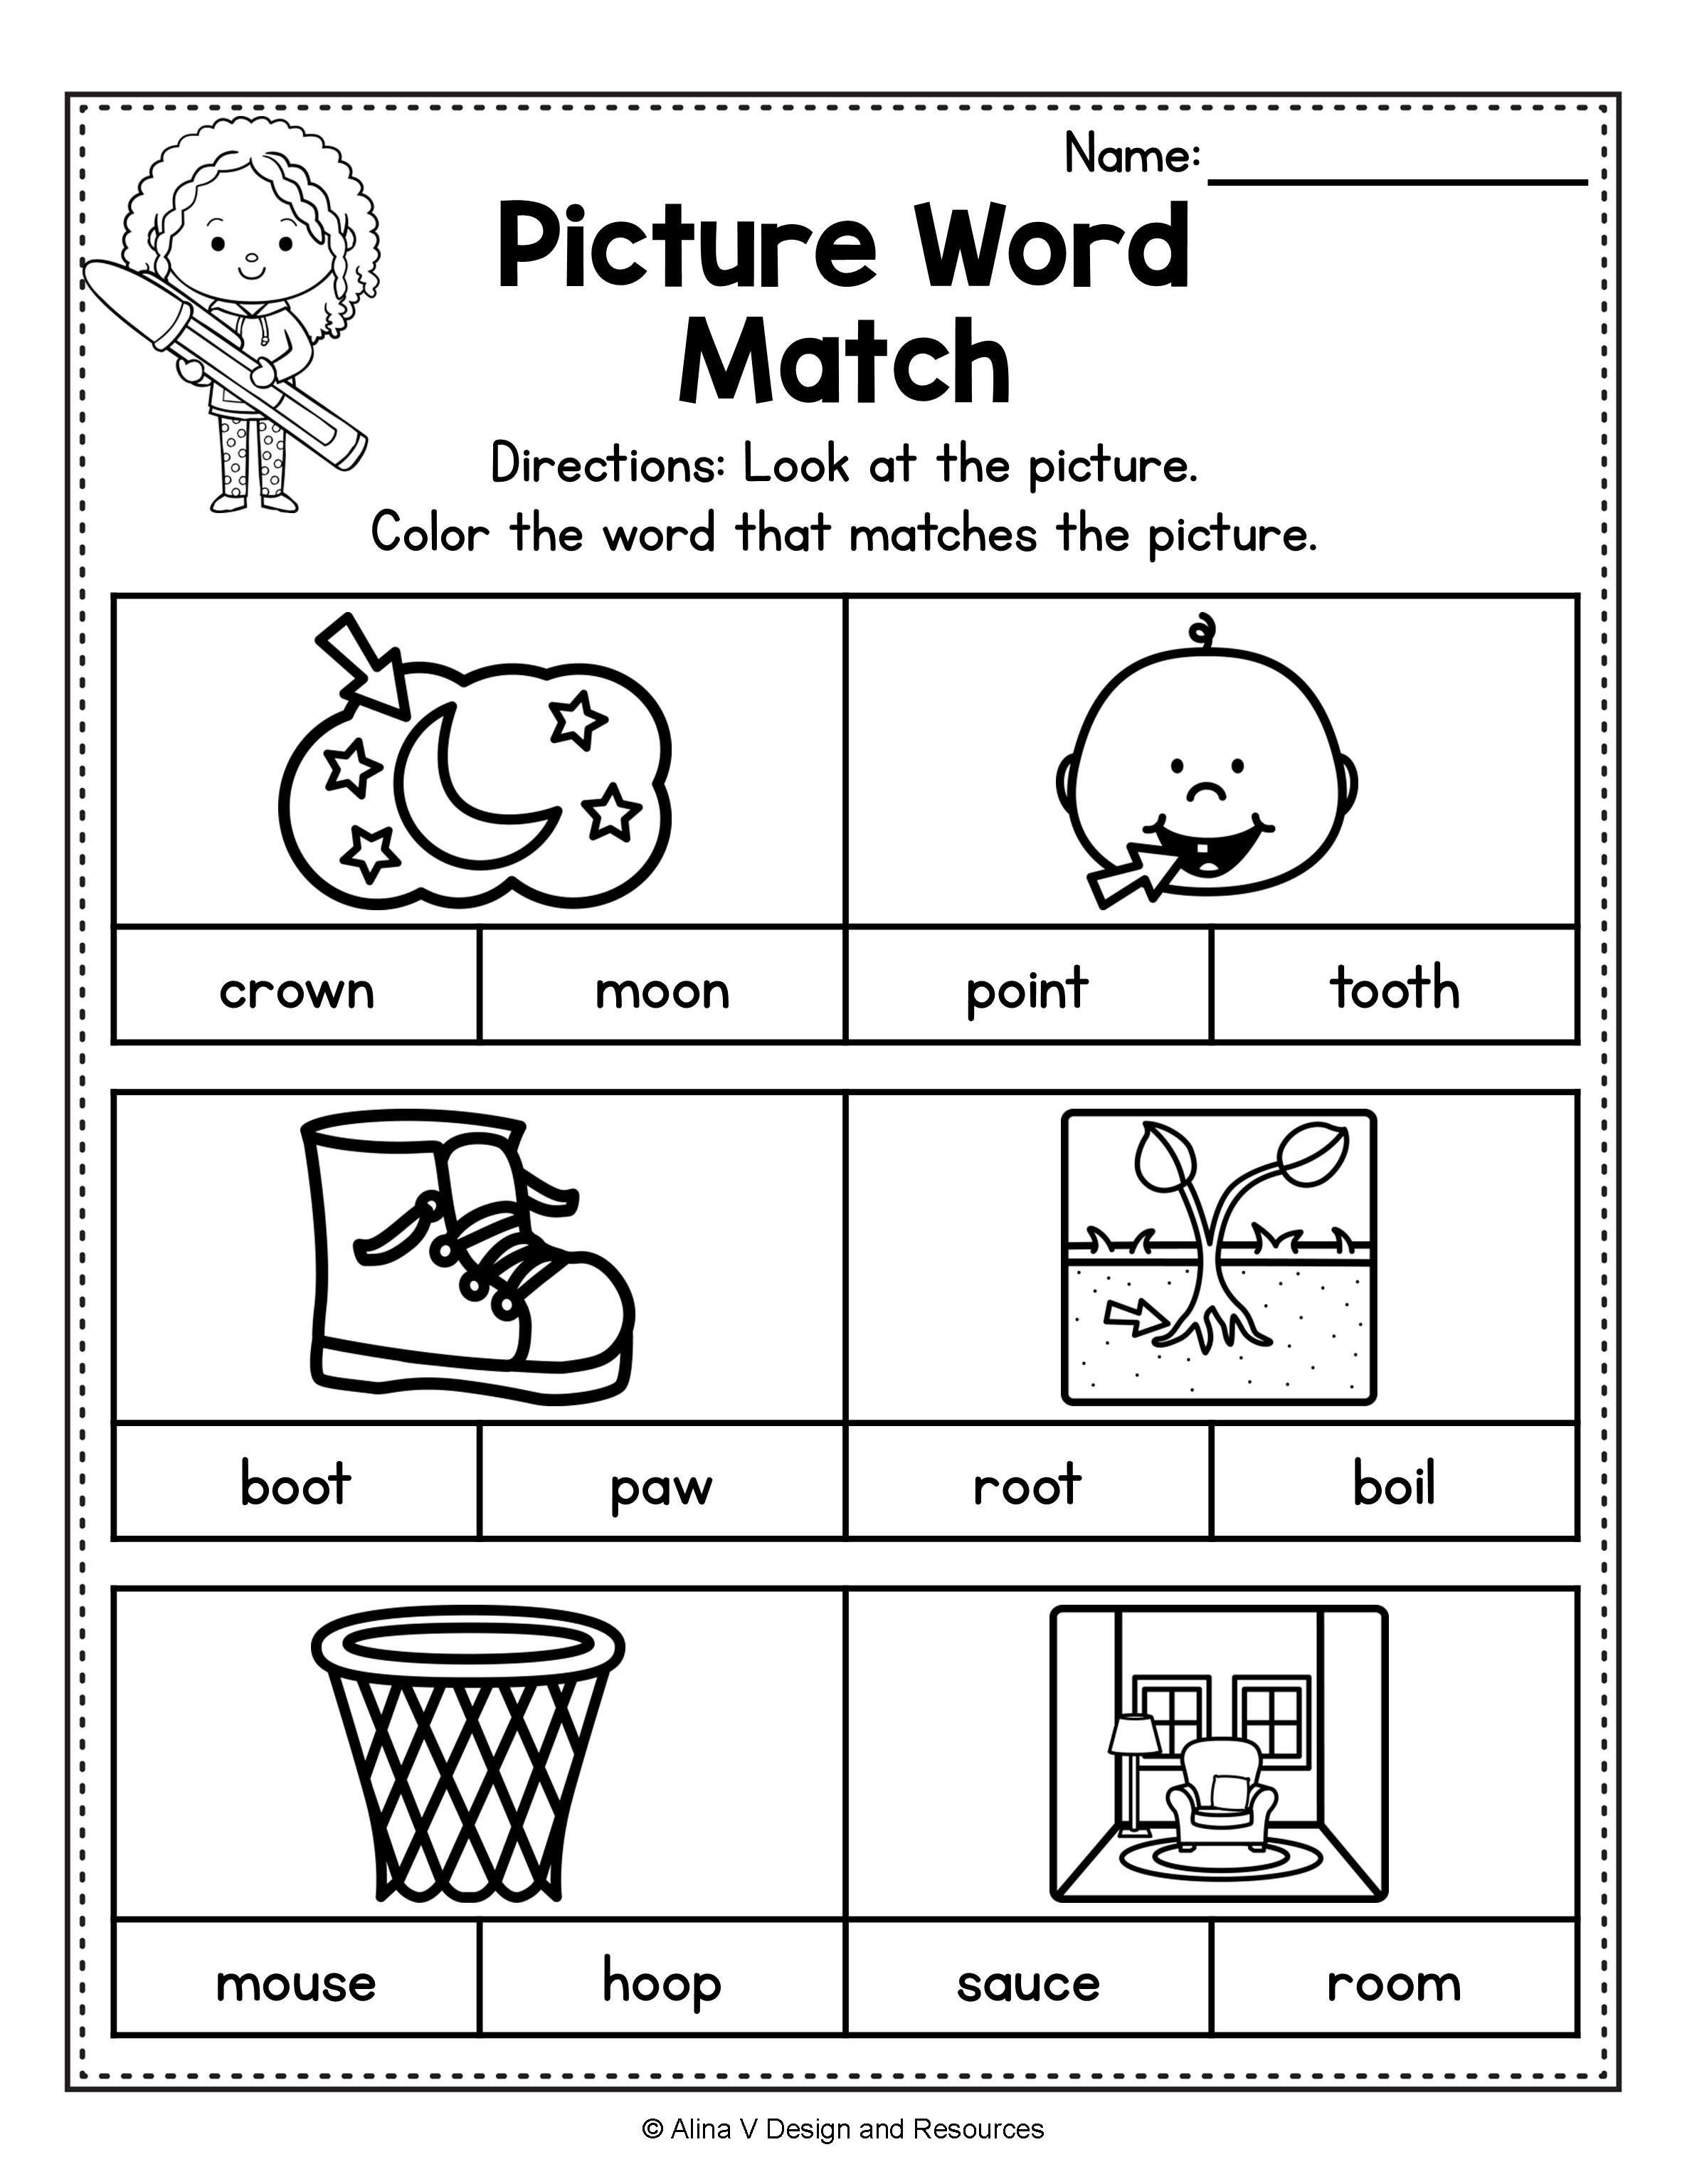 Diphthong Activities Bundle Diphthong Activities Vowel Diphthongs Worksheets In 2020 Phonics Activities 2nd Grade Activities Phonics Kindergarten